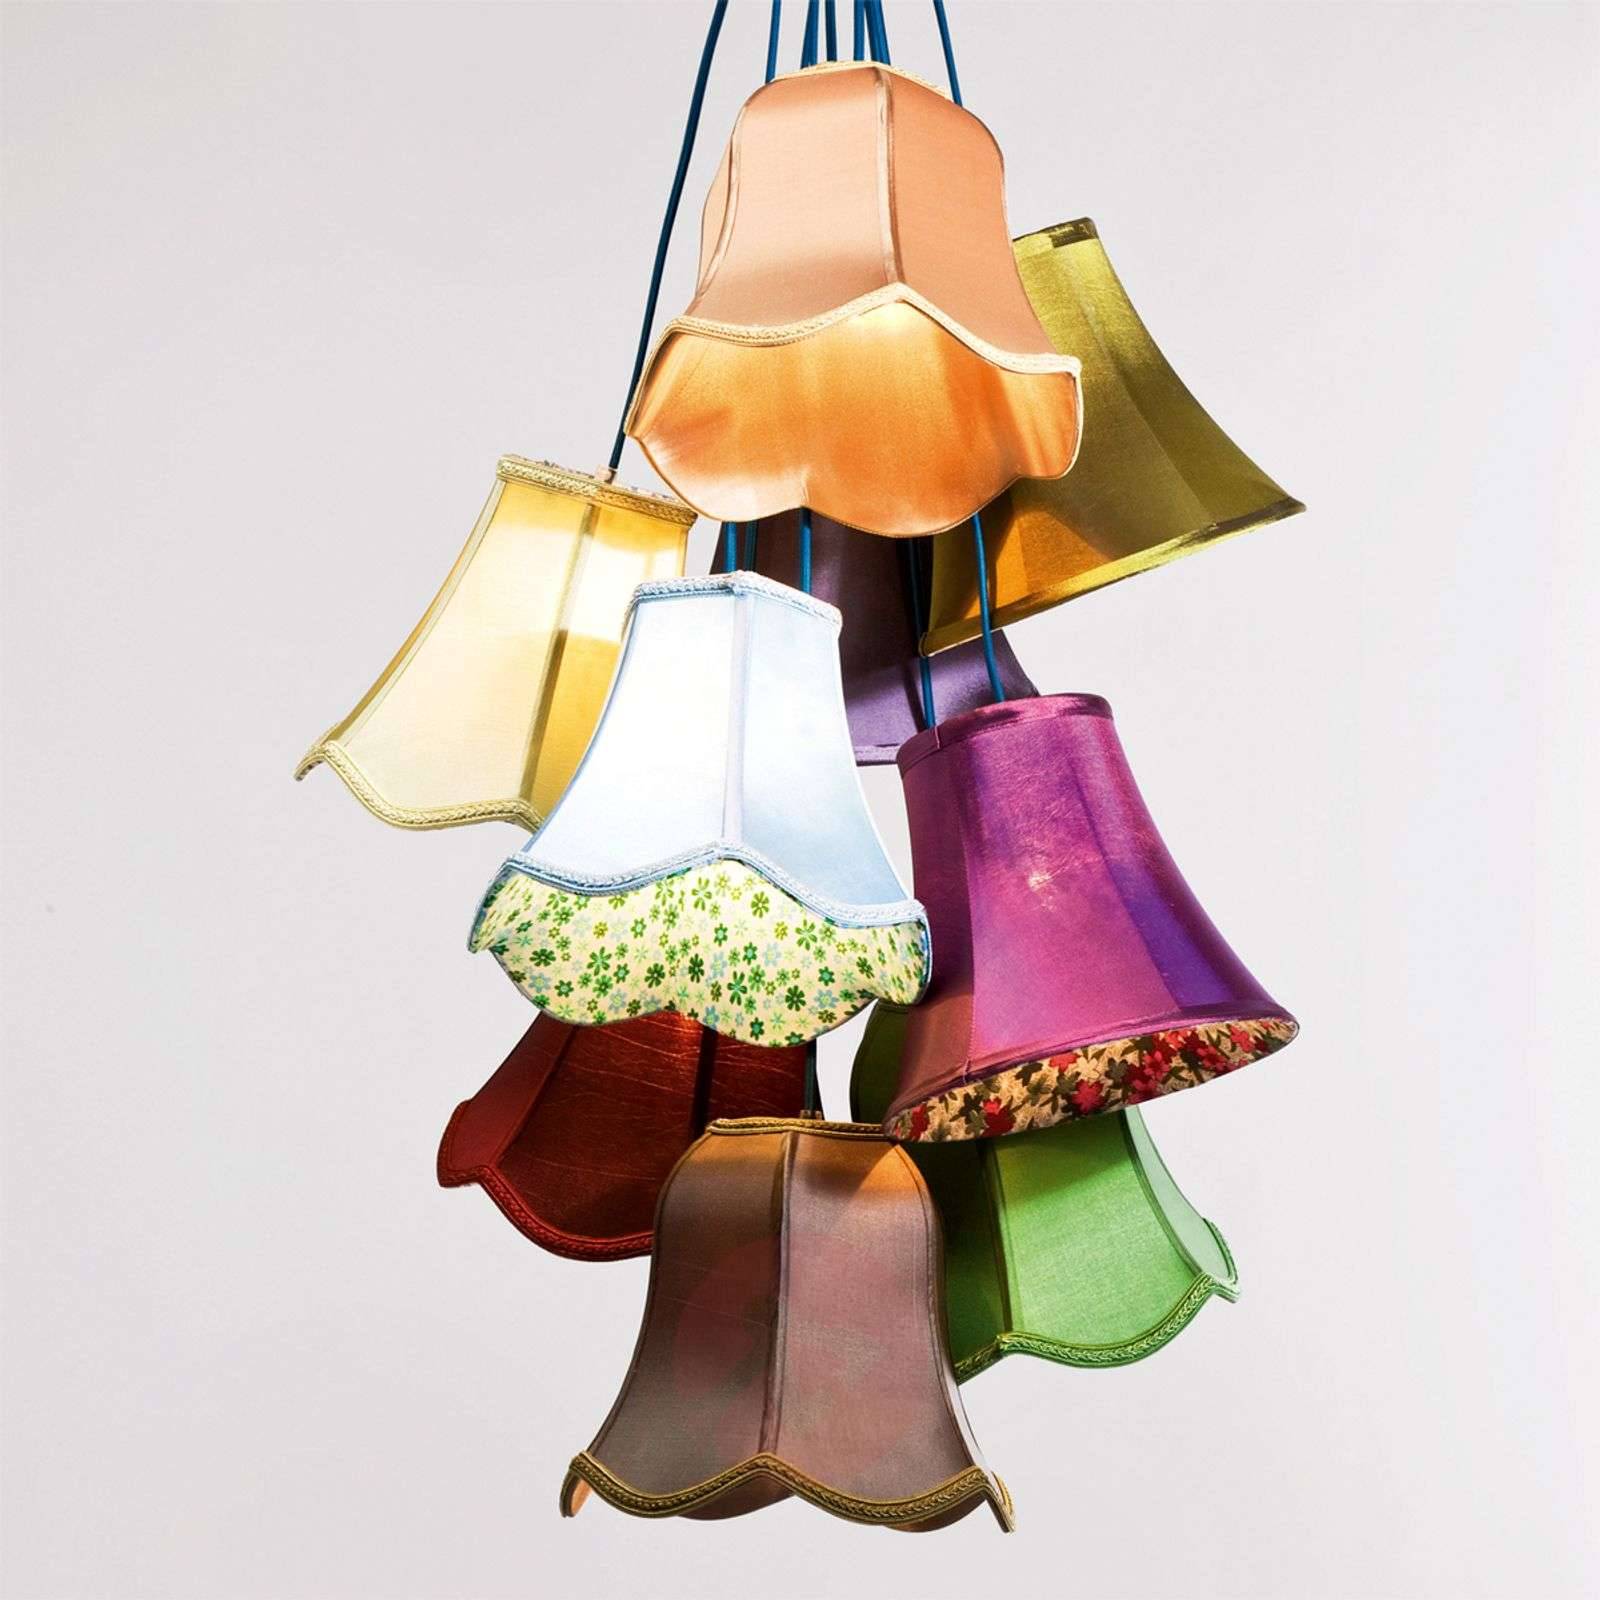 KARE Saloon Flower colourful hanging light-5517147-01